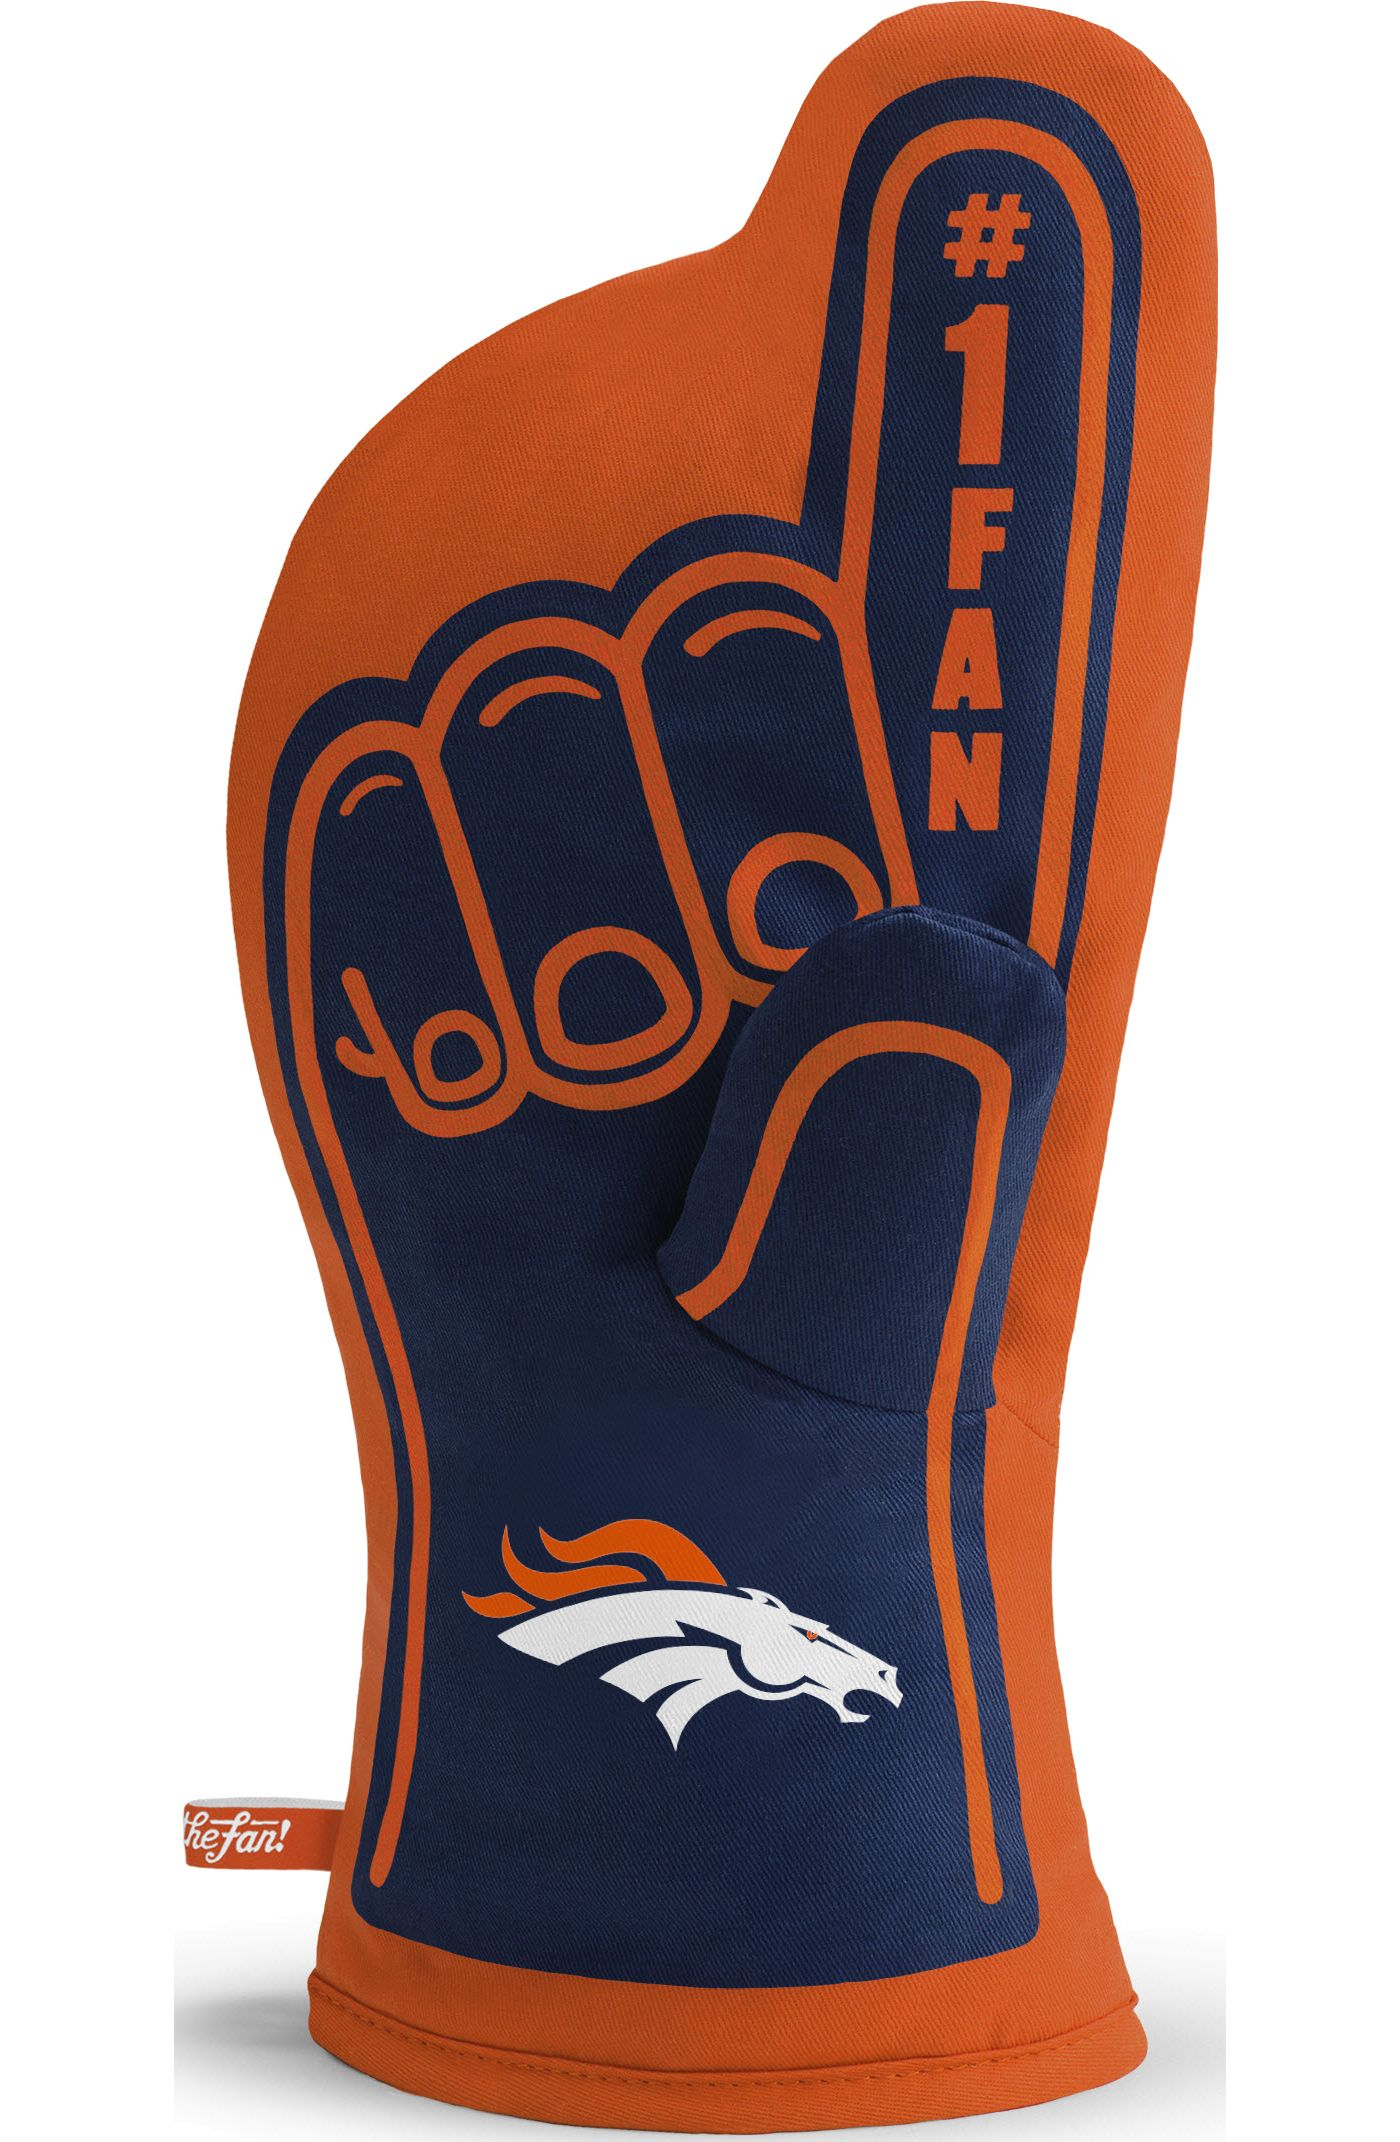 You The Fan Denver Broncos #1 Oven Mitt